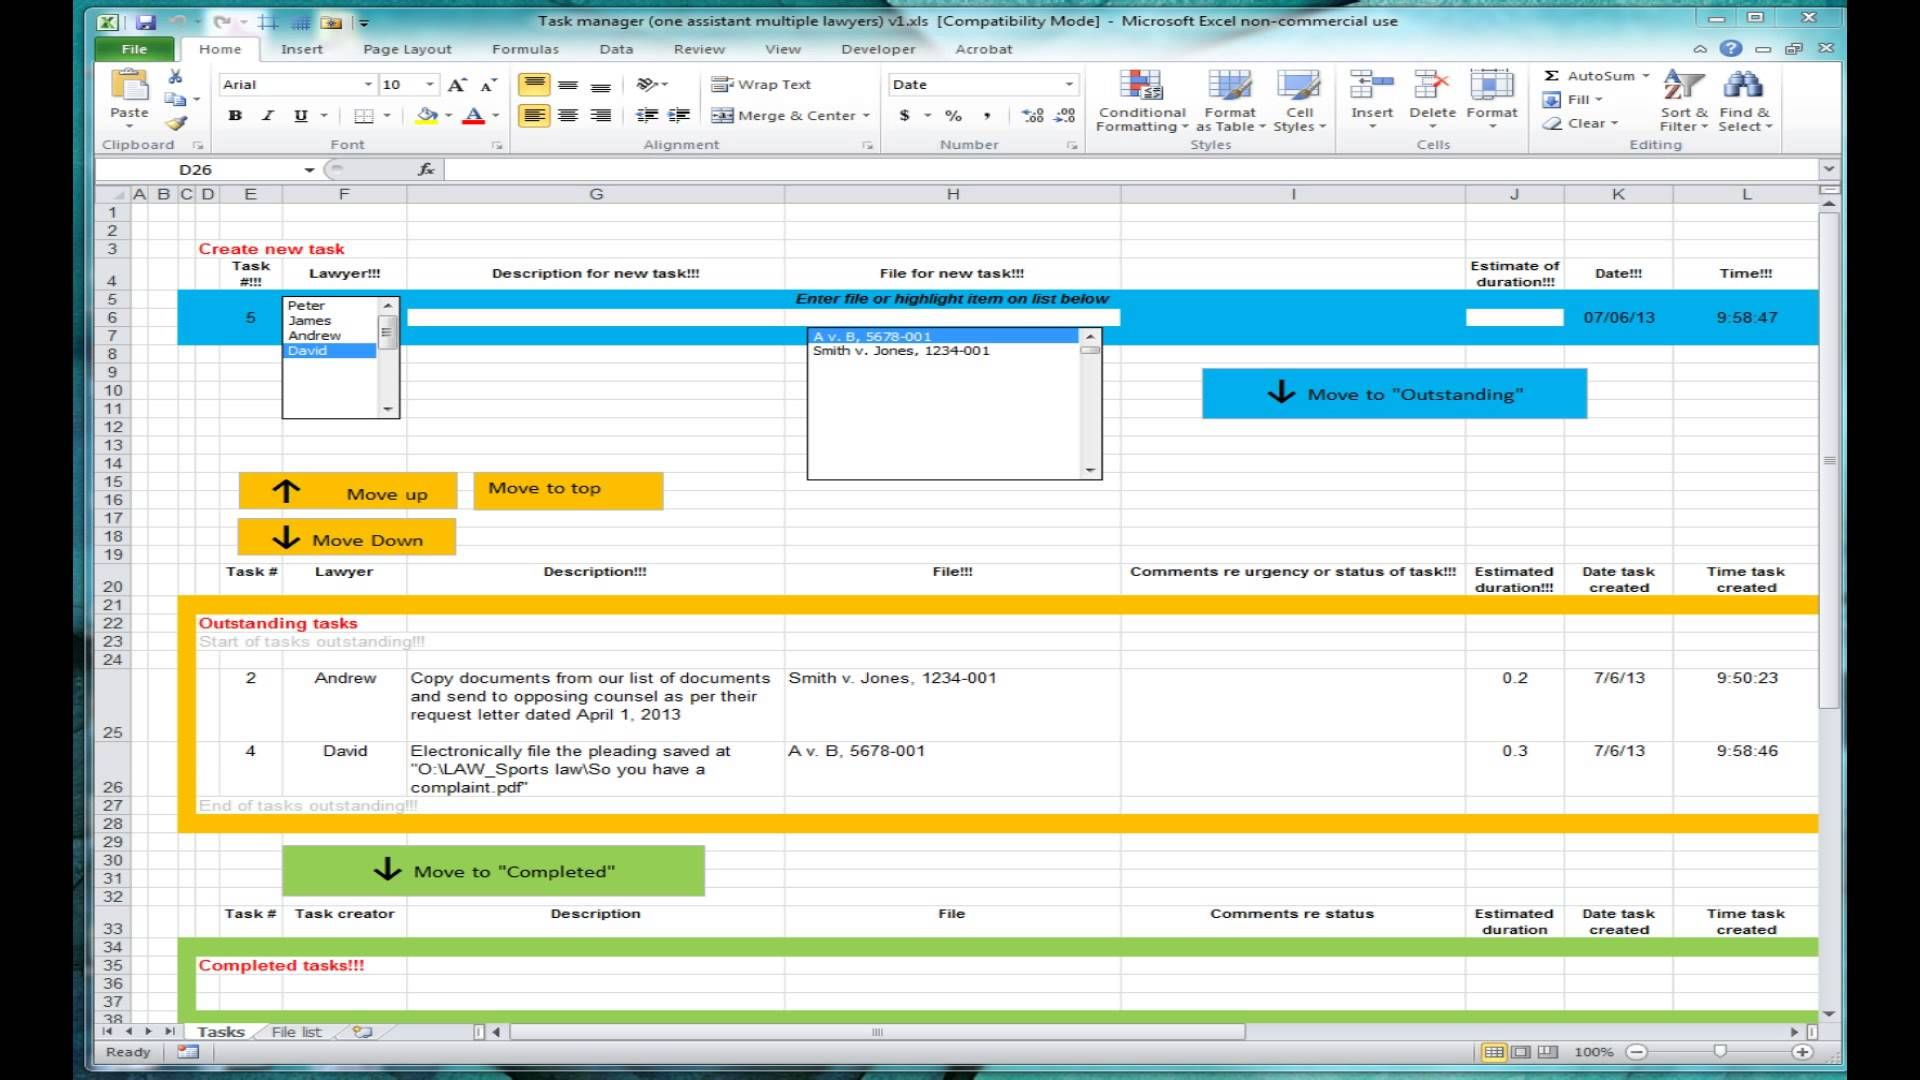 Excel Spreadsheet For Tracking Tasks Shared Workbook Youtube